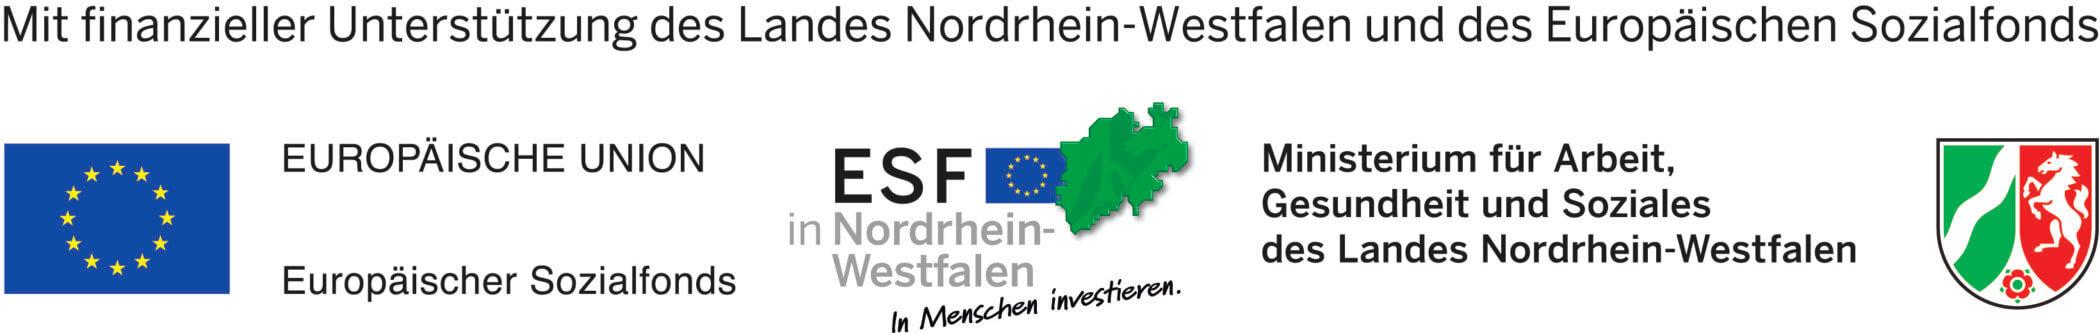 eu_esf-nrw_mags_fh_4c-logo